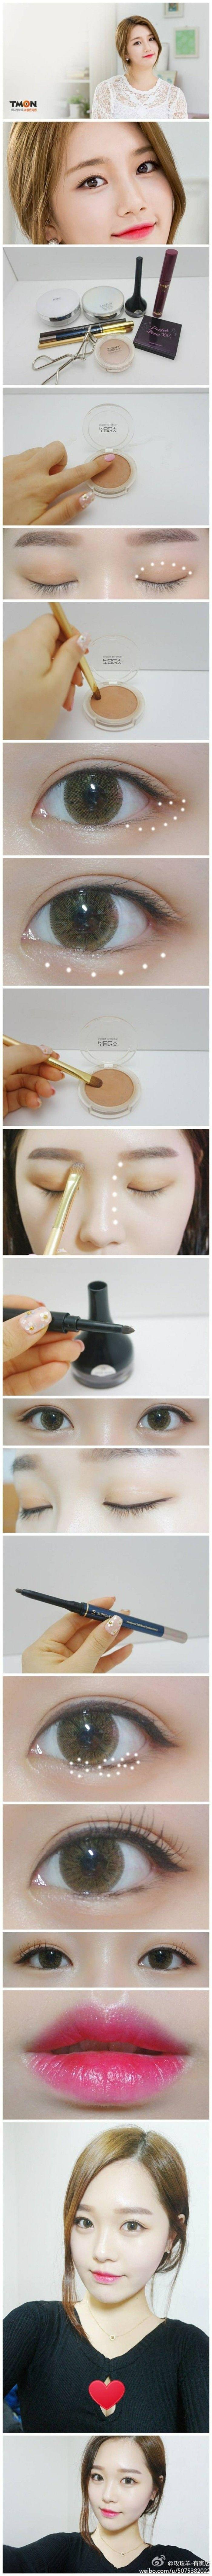 korean makeup tutorial  ||  ⭐️⭐️   #JoinNerium #DebbieKrug #NeriumKorea…